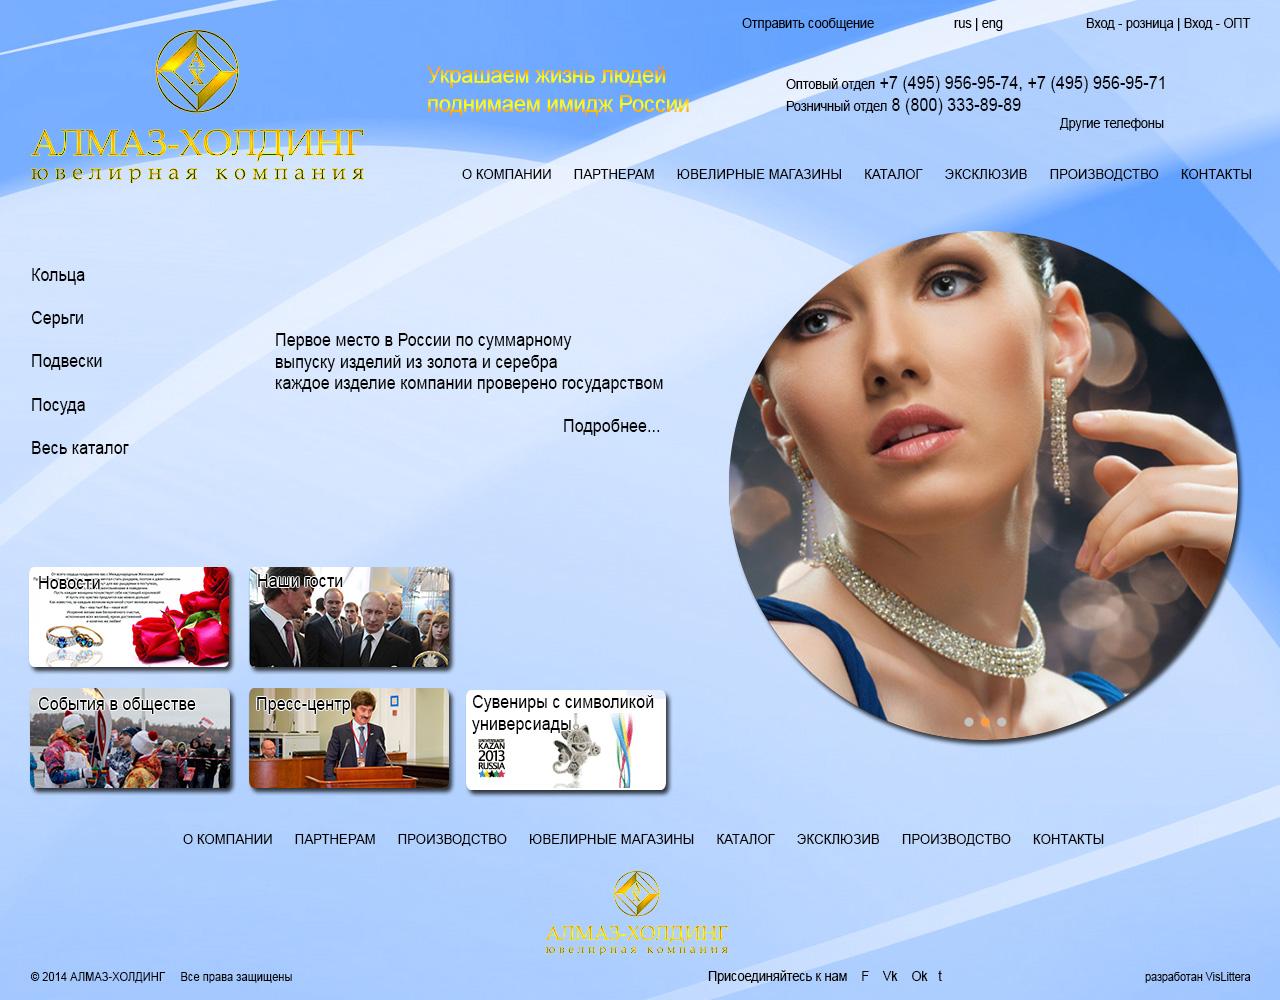 Дизайн сайта для ювелирной компании Алмаз-Холдинг фото f_734531e1d47bb9bf.jpg